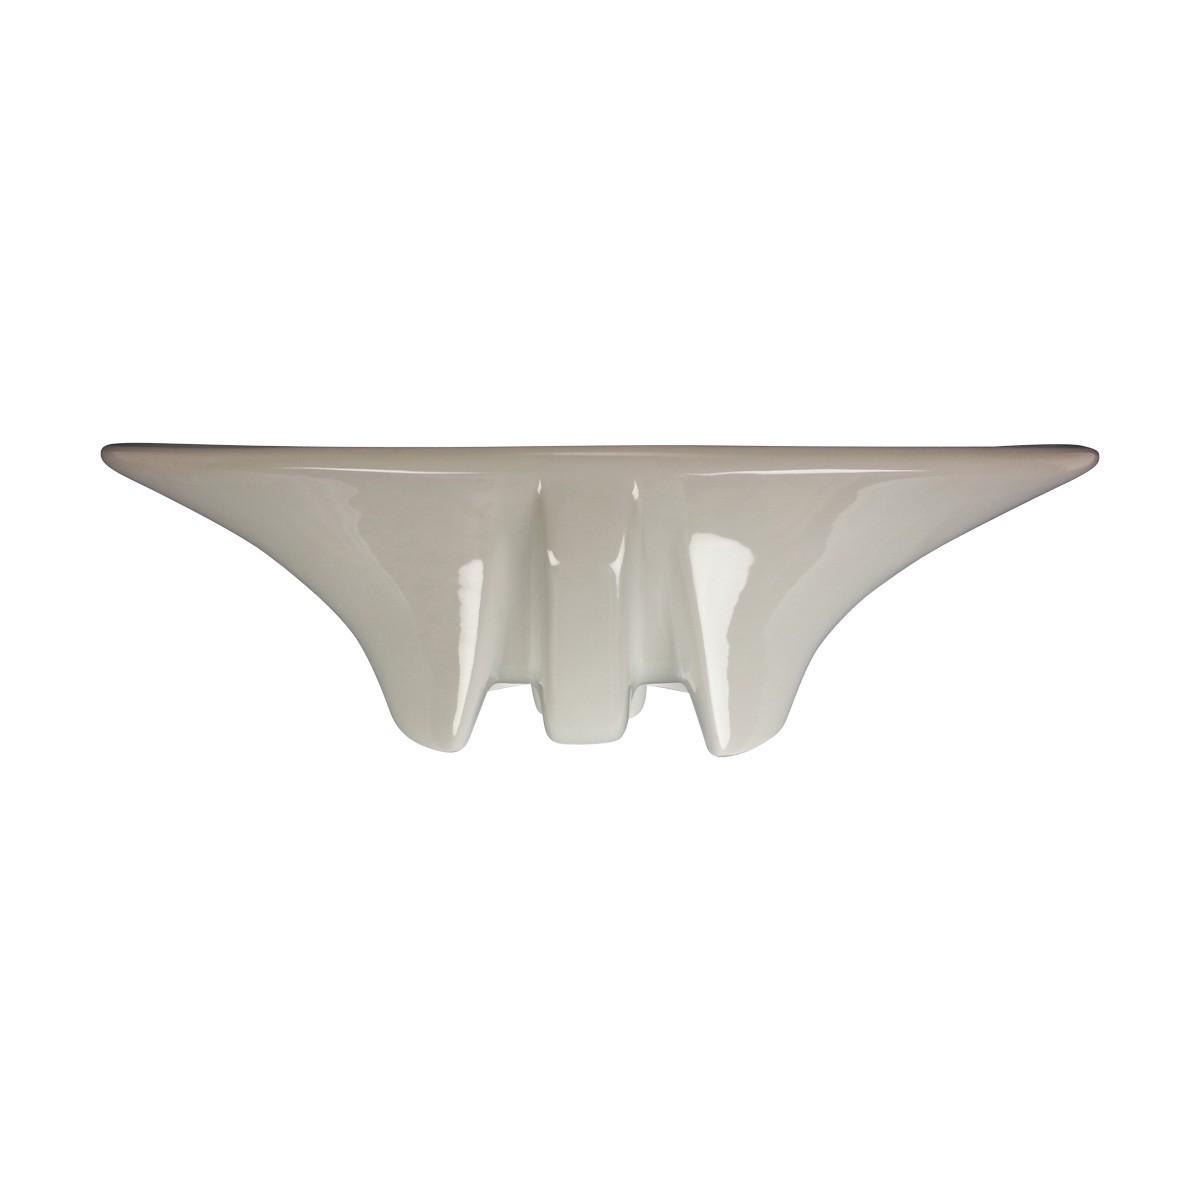 Bathroom Vessel Sink White Porcelain Capello bathroom vessel sinks Countertop vessel sink ceramic porcelain basin remodel small